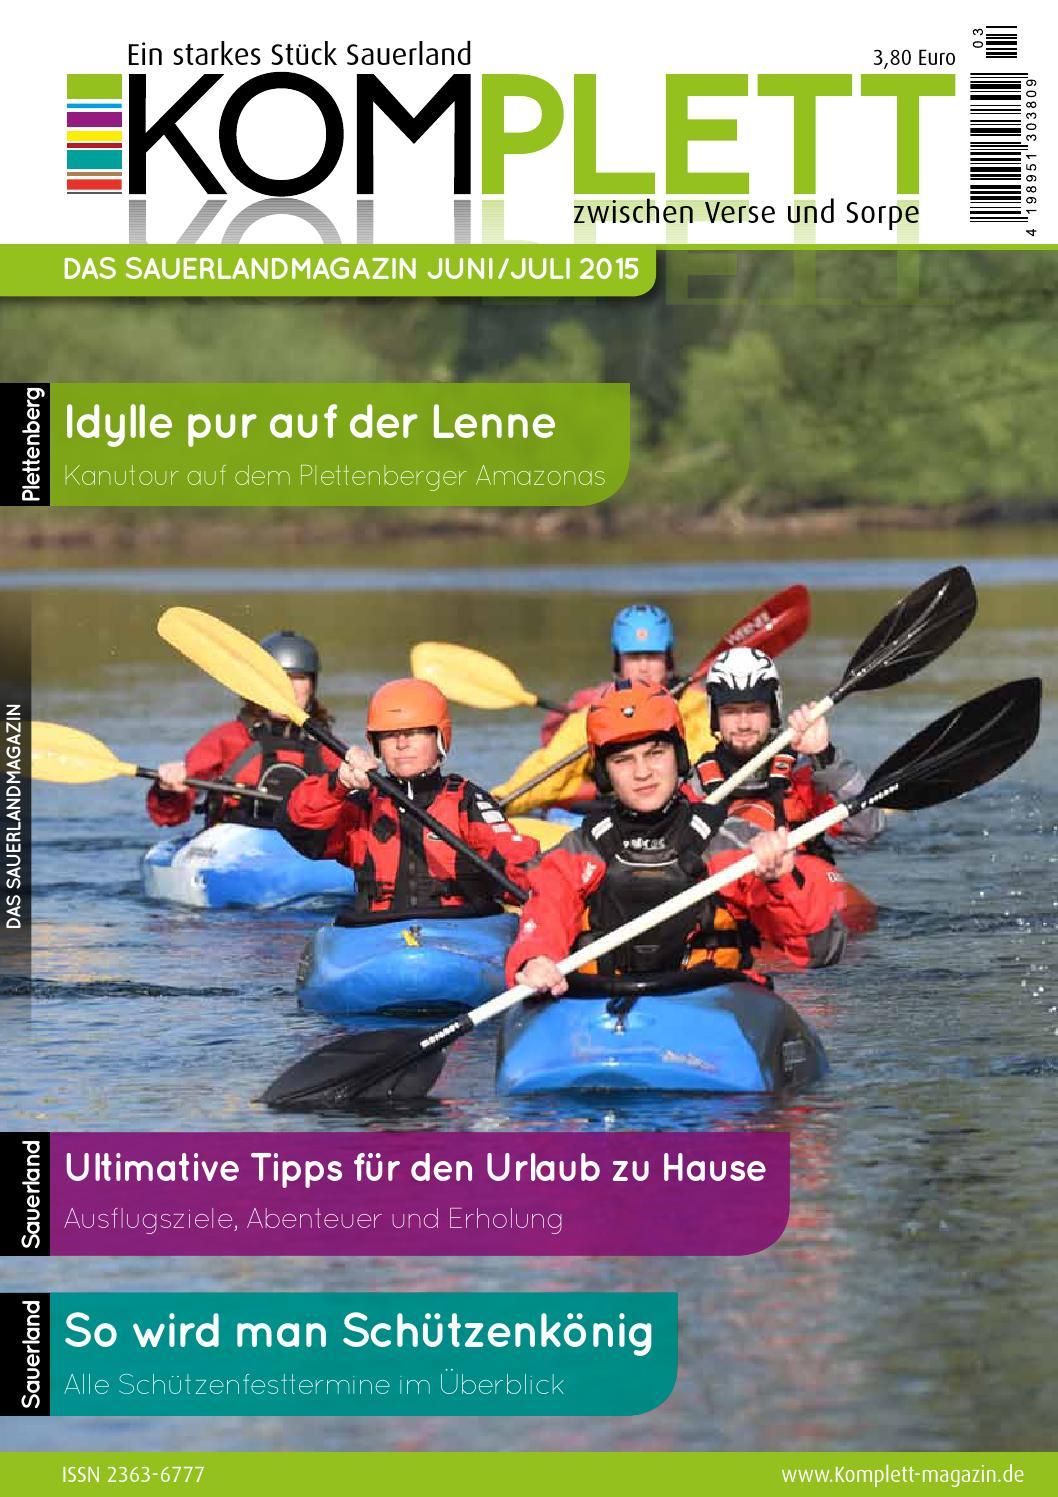 Komplett Das Sauerlandmagazin Juni/Juli 2015 by Komplett Das ...